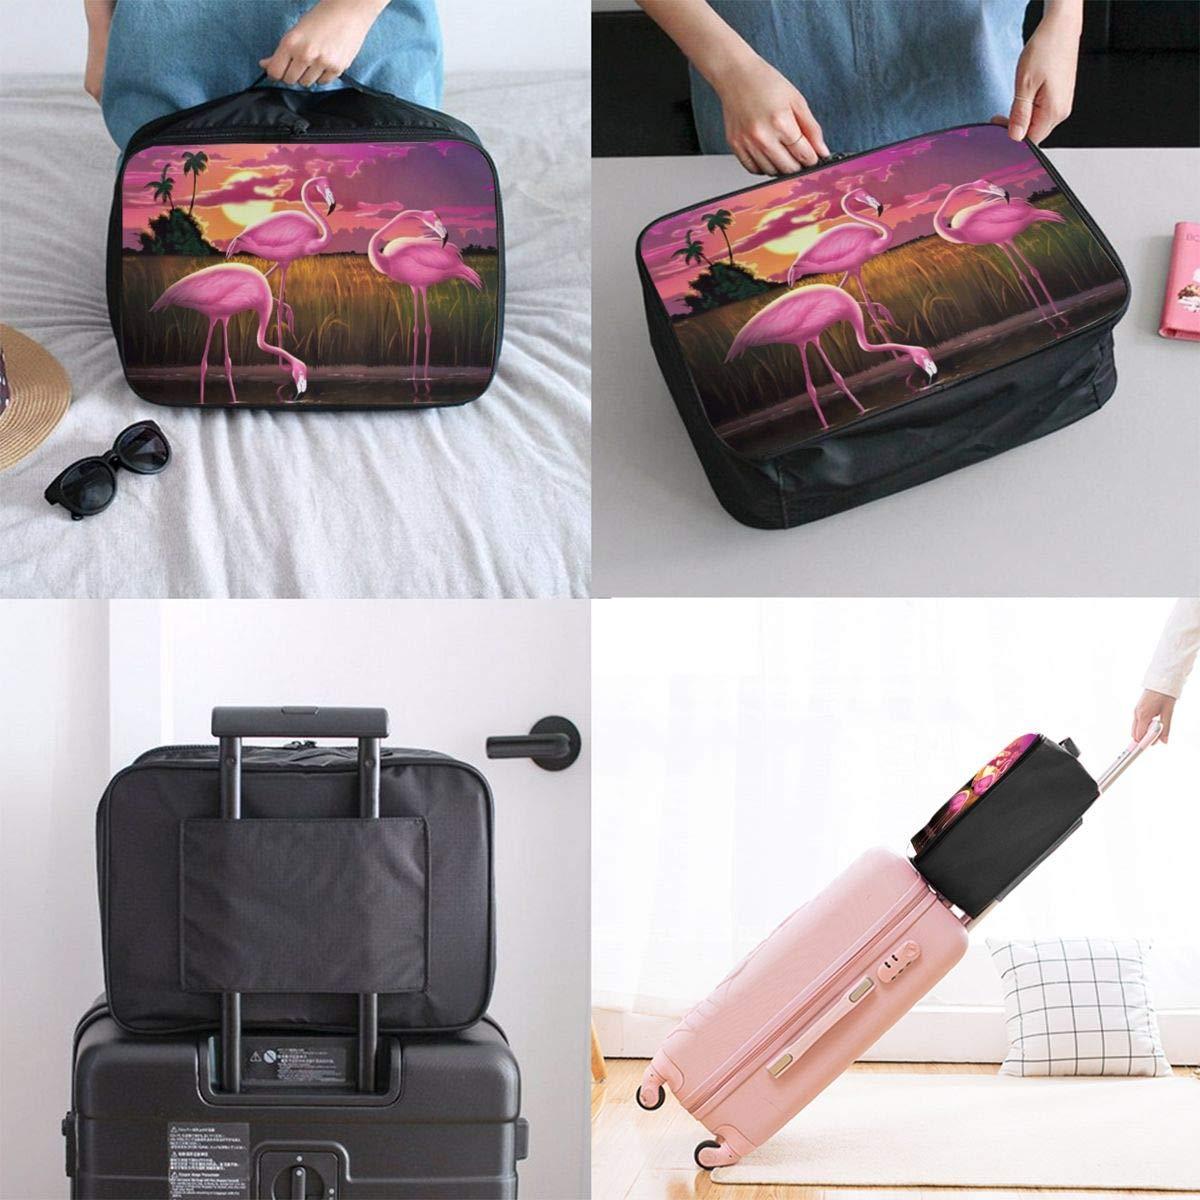 Flamingo Blossom Travel Bag Cute Luggage Bags Duffle Bag Large Capacity Travel Organizer Bag